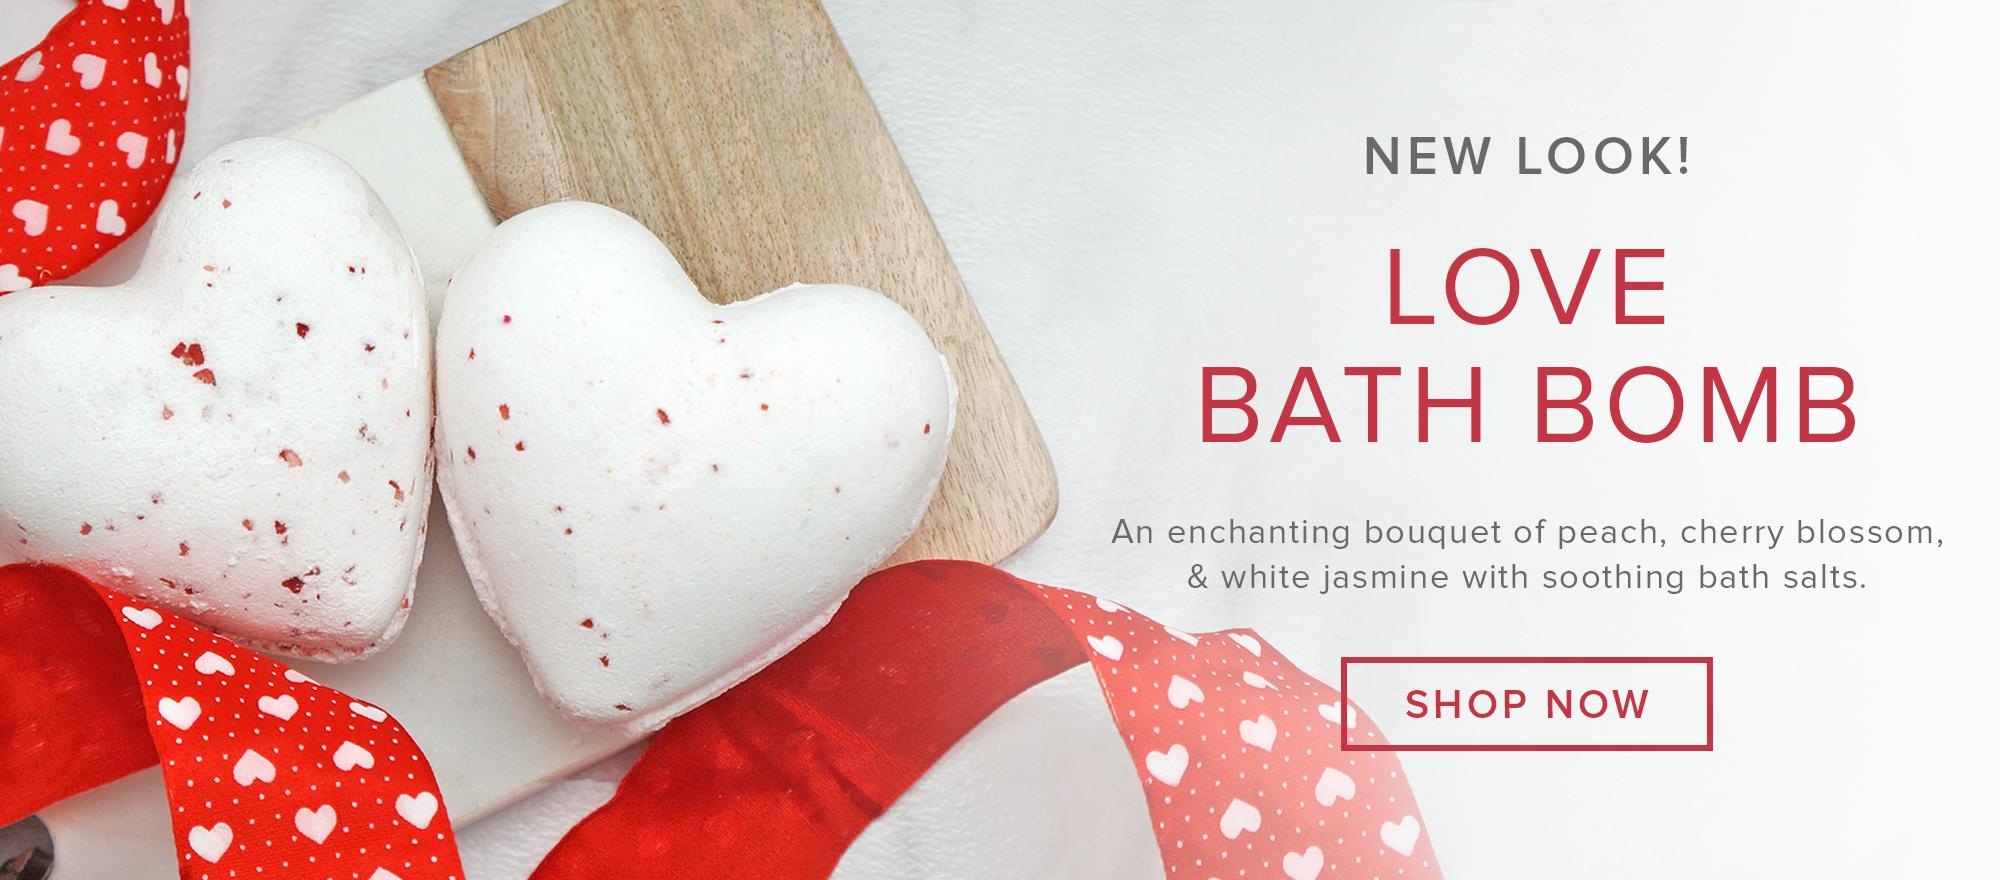 Love Bath Bomb